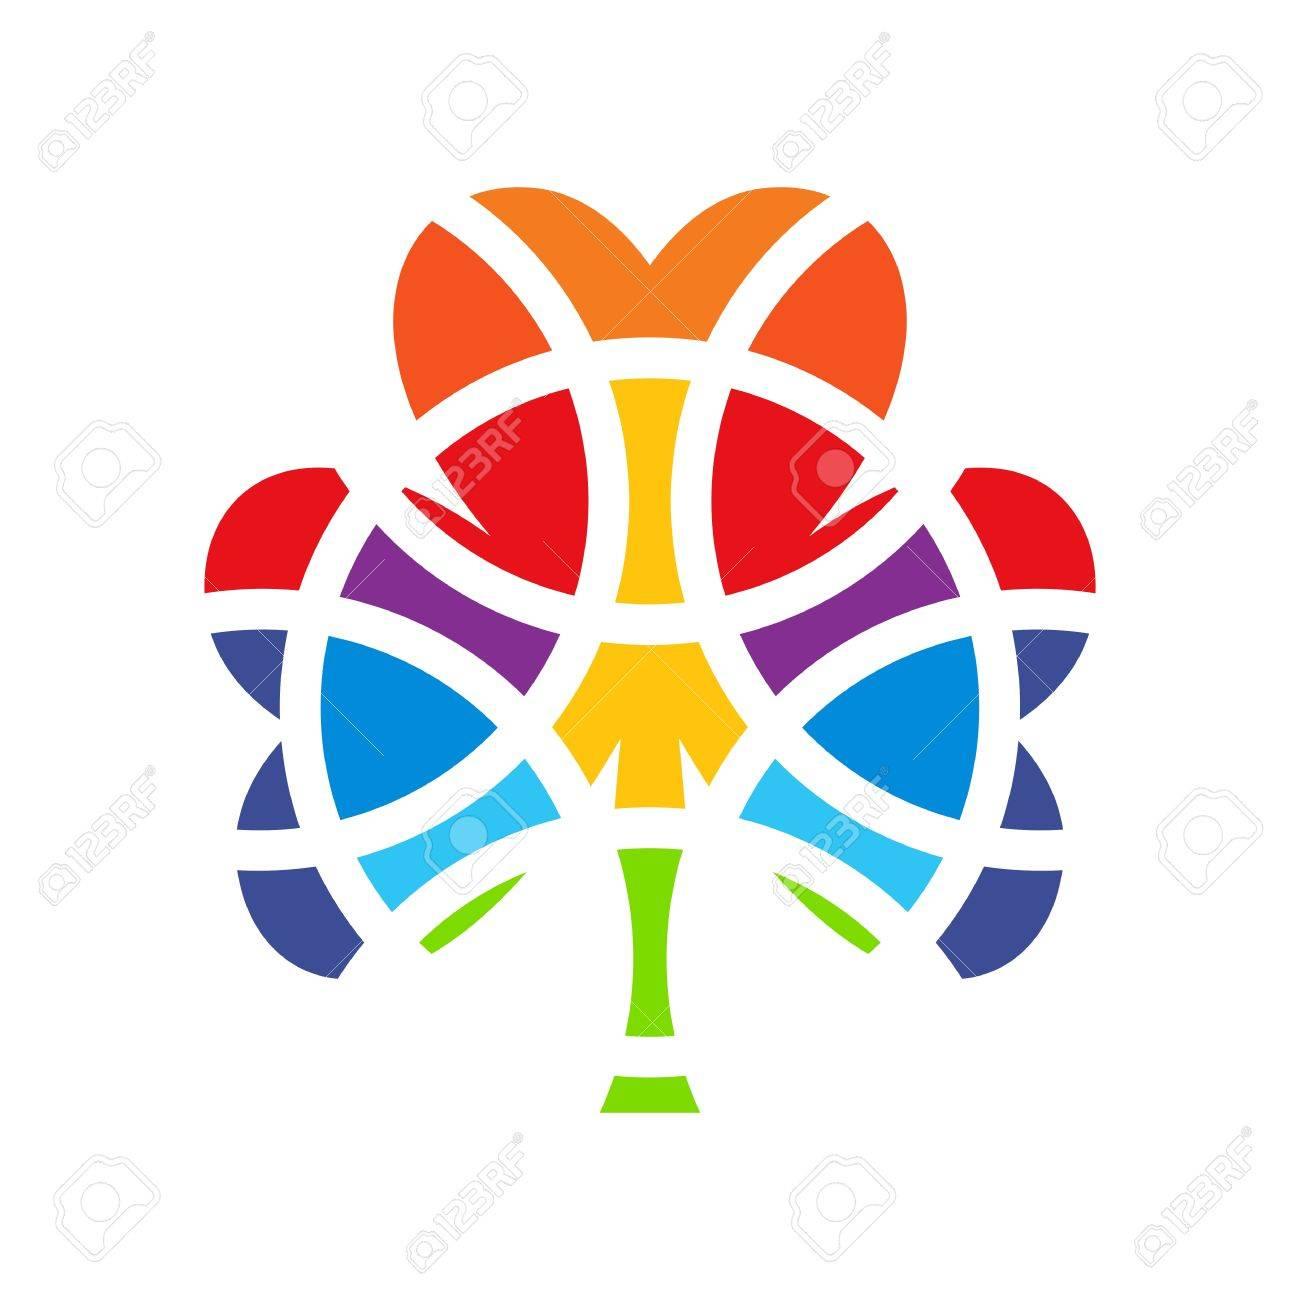 shamrock design element mosaic style colored four leaf clover icon white background